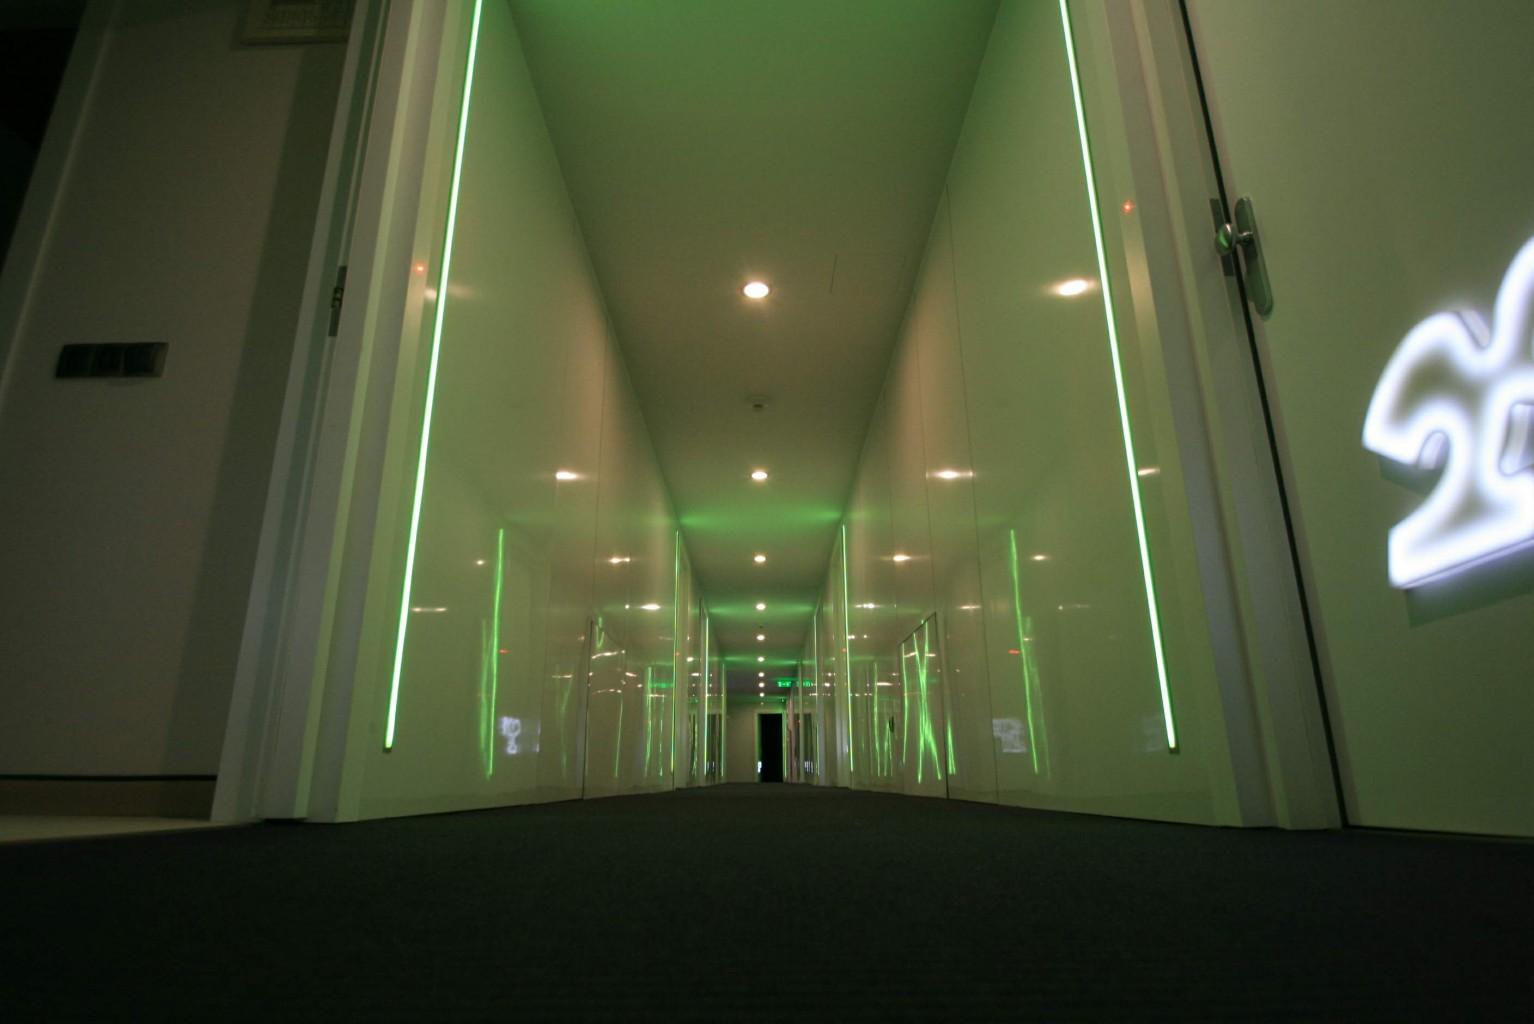 hol schimb culoare placare hpl 3mm alb lucios reflexiv usi cu numere plexiglas iluminate 2